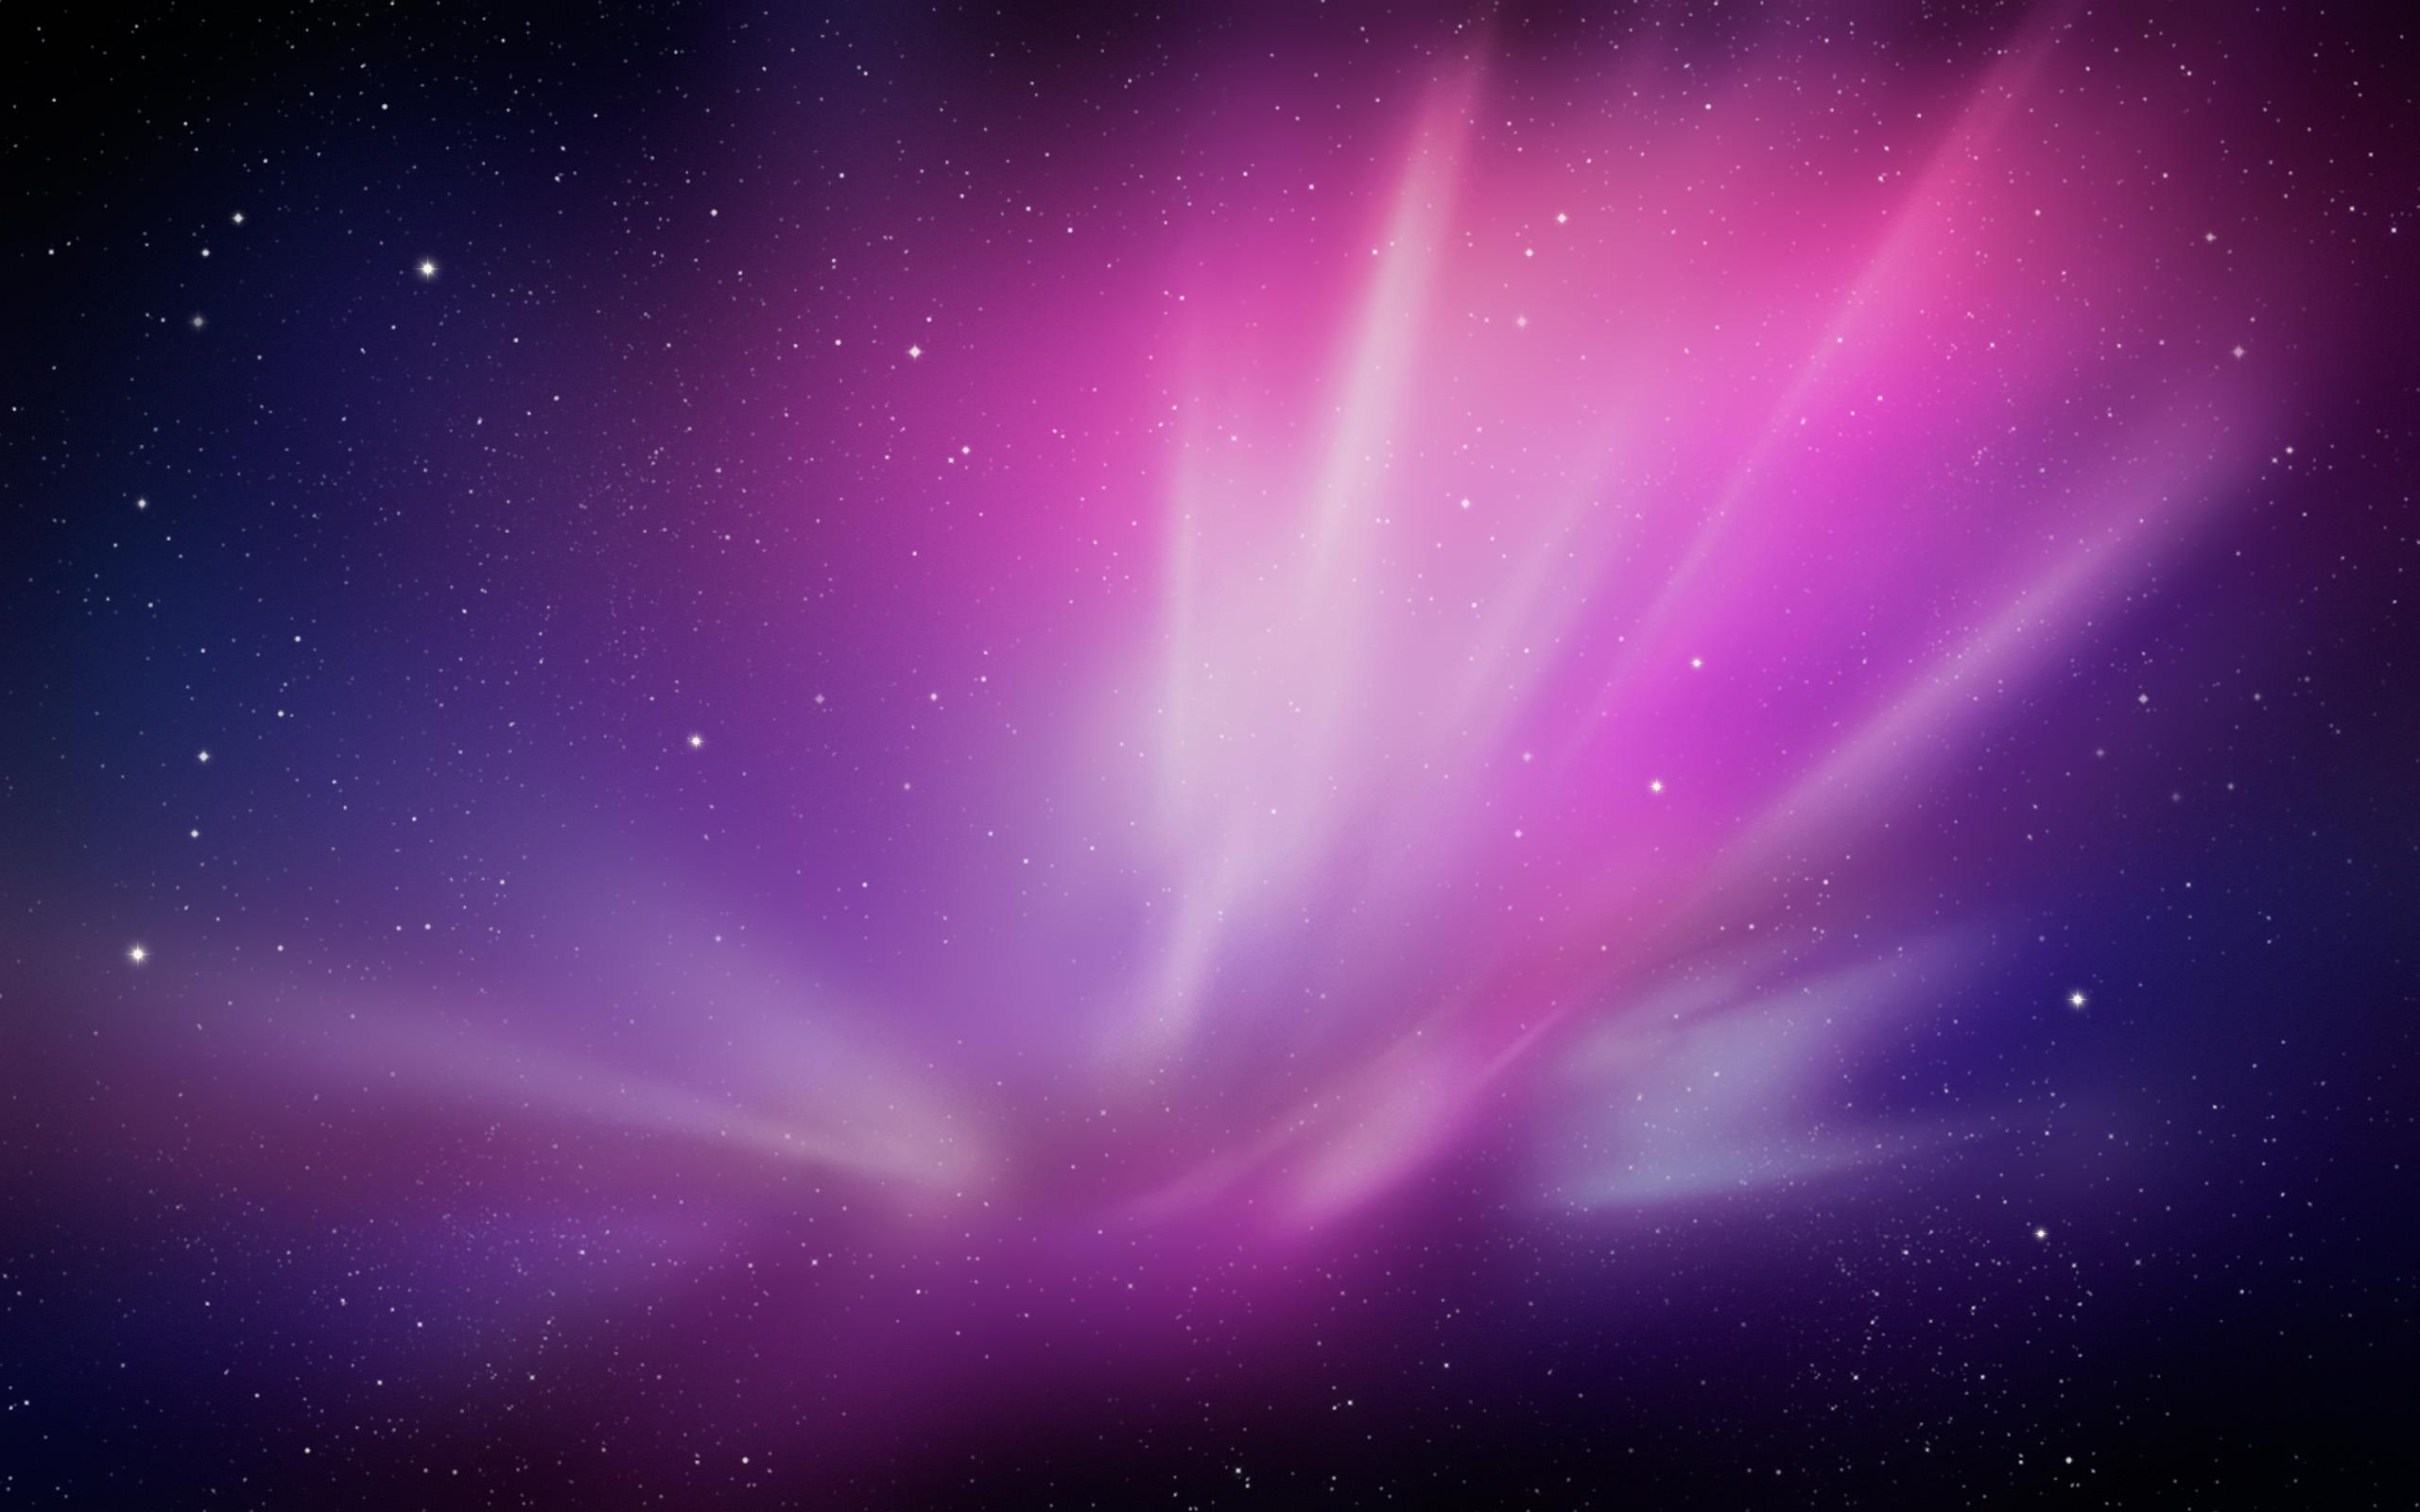 ... Mac OS HD Wallpaper and MacBook Pro Retina Display Zebra Background